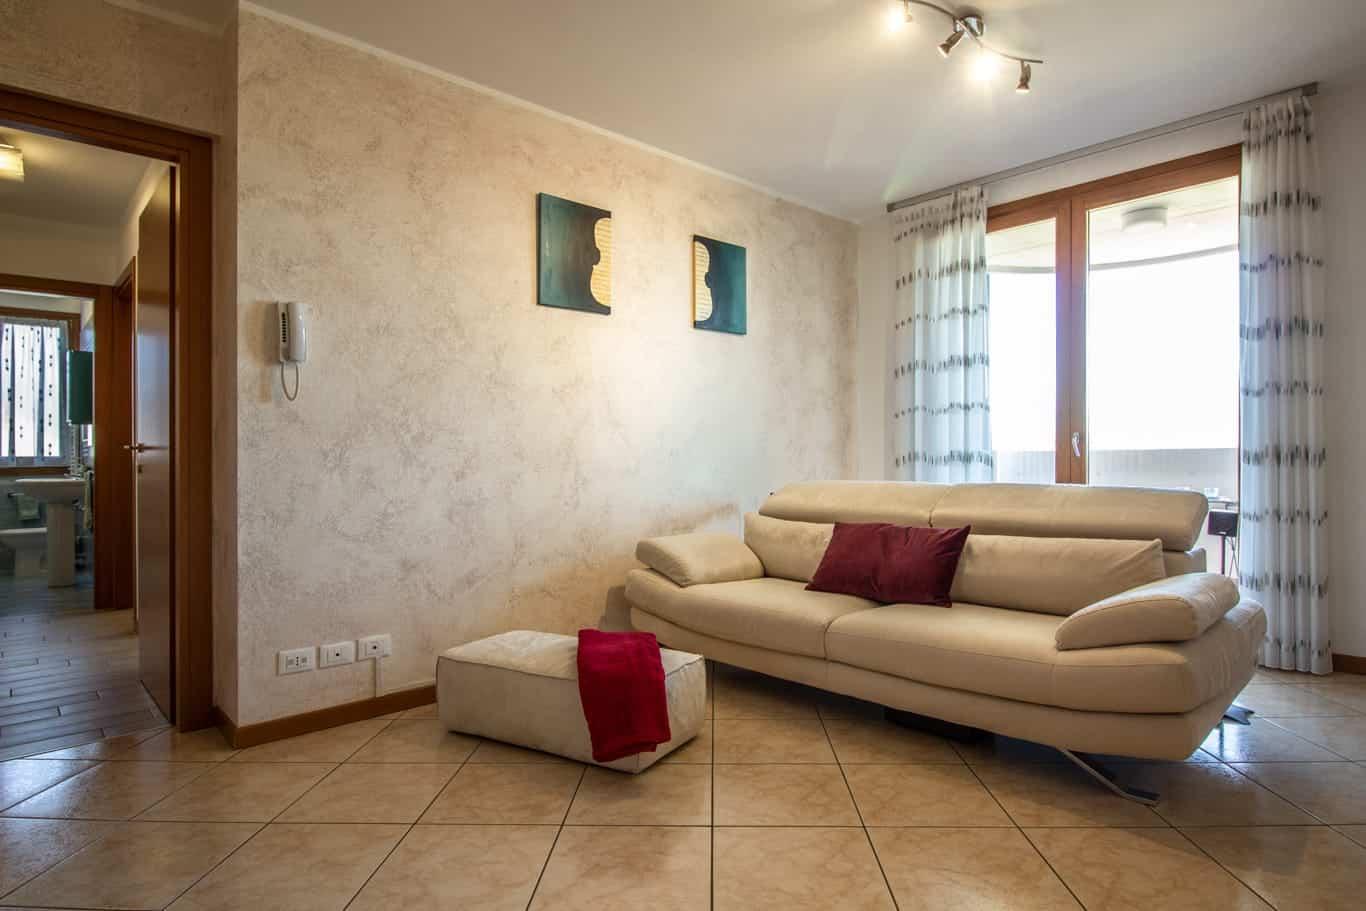 Appartamento_cimpello (1 of 8)